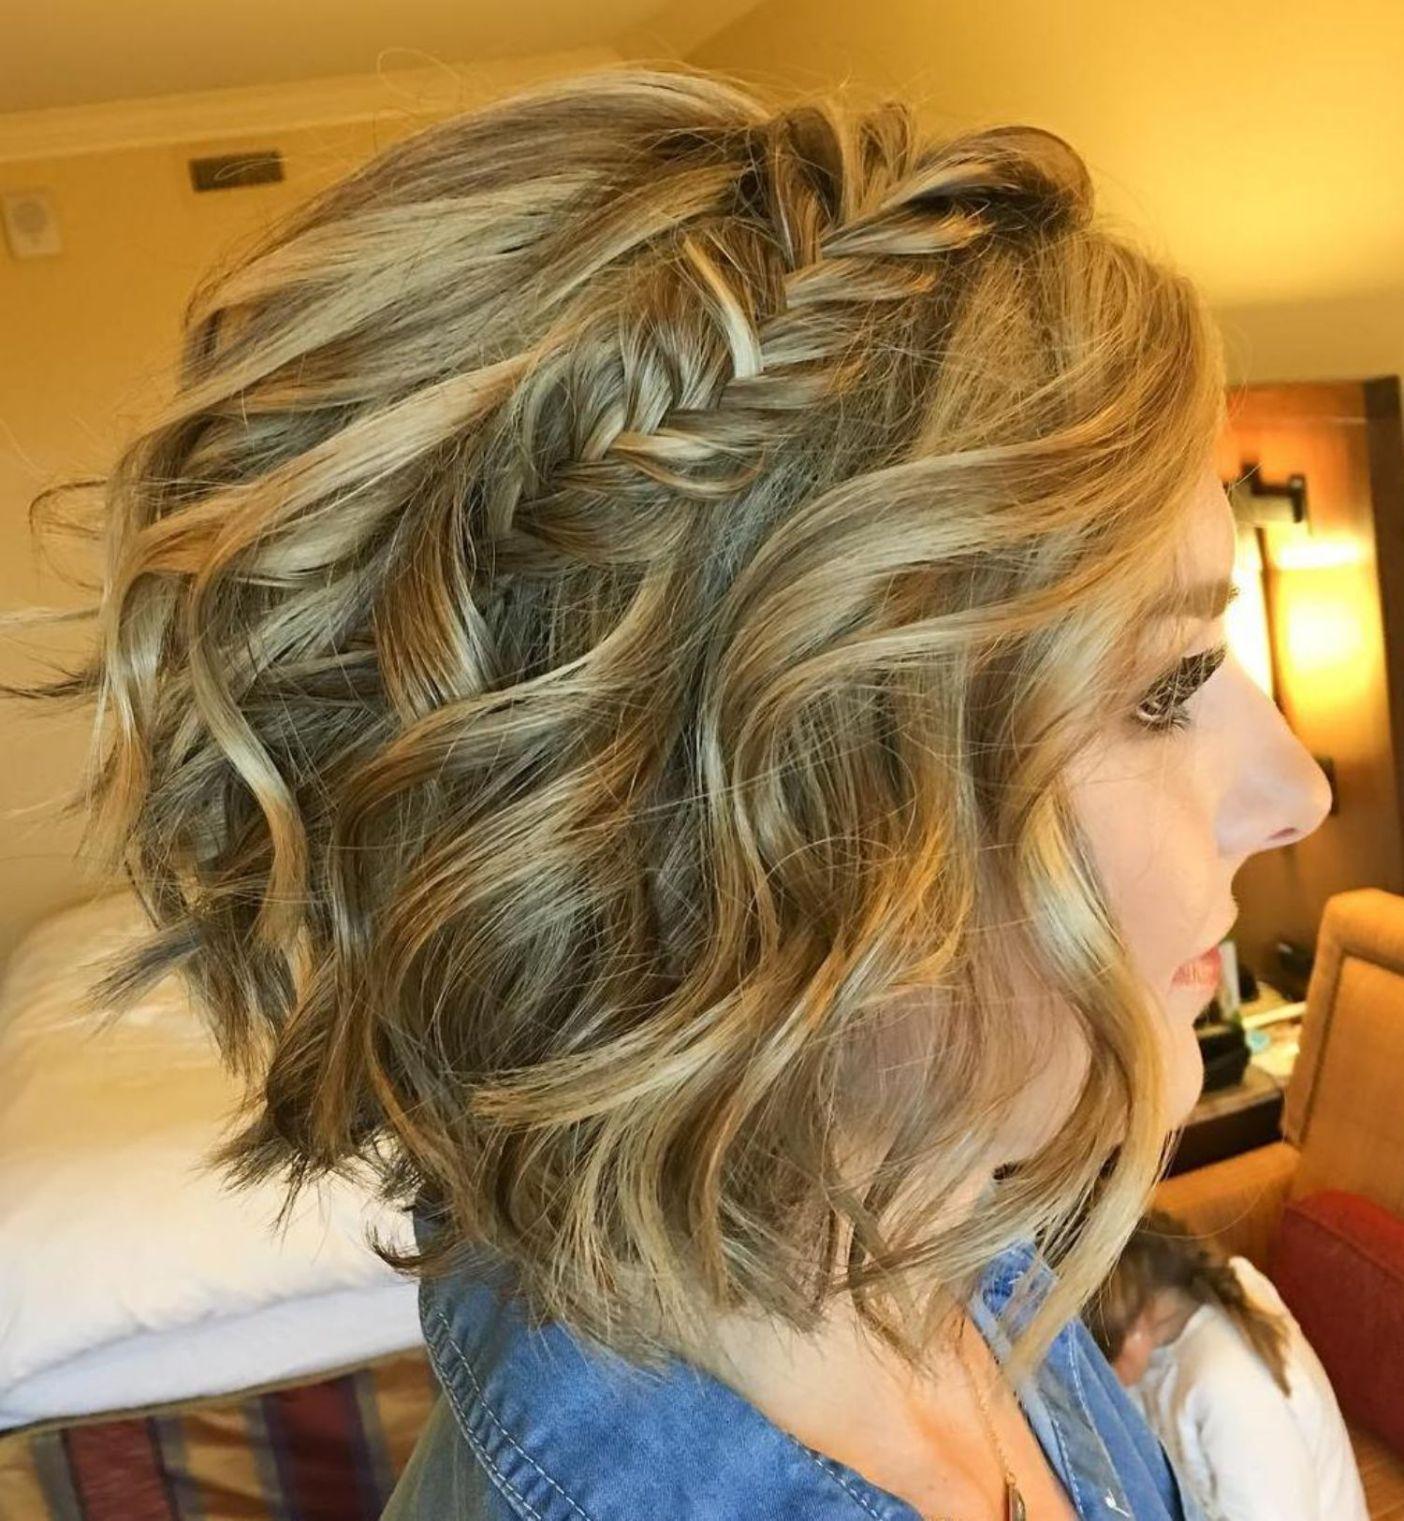 60 Creative Updo Ideas for Short Hair